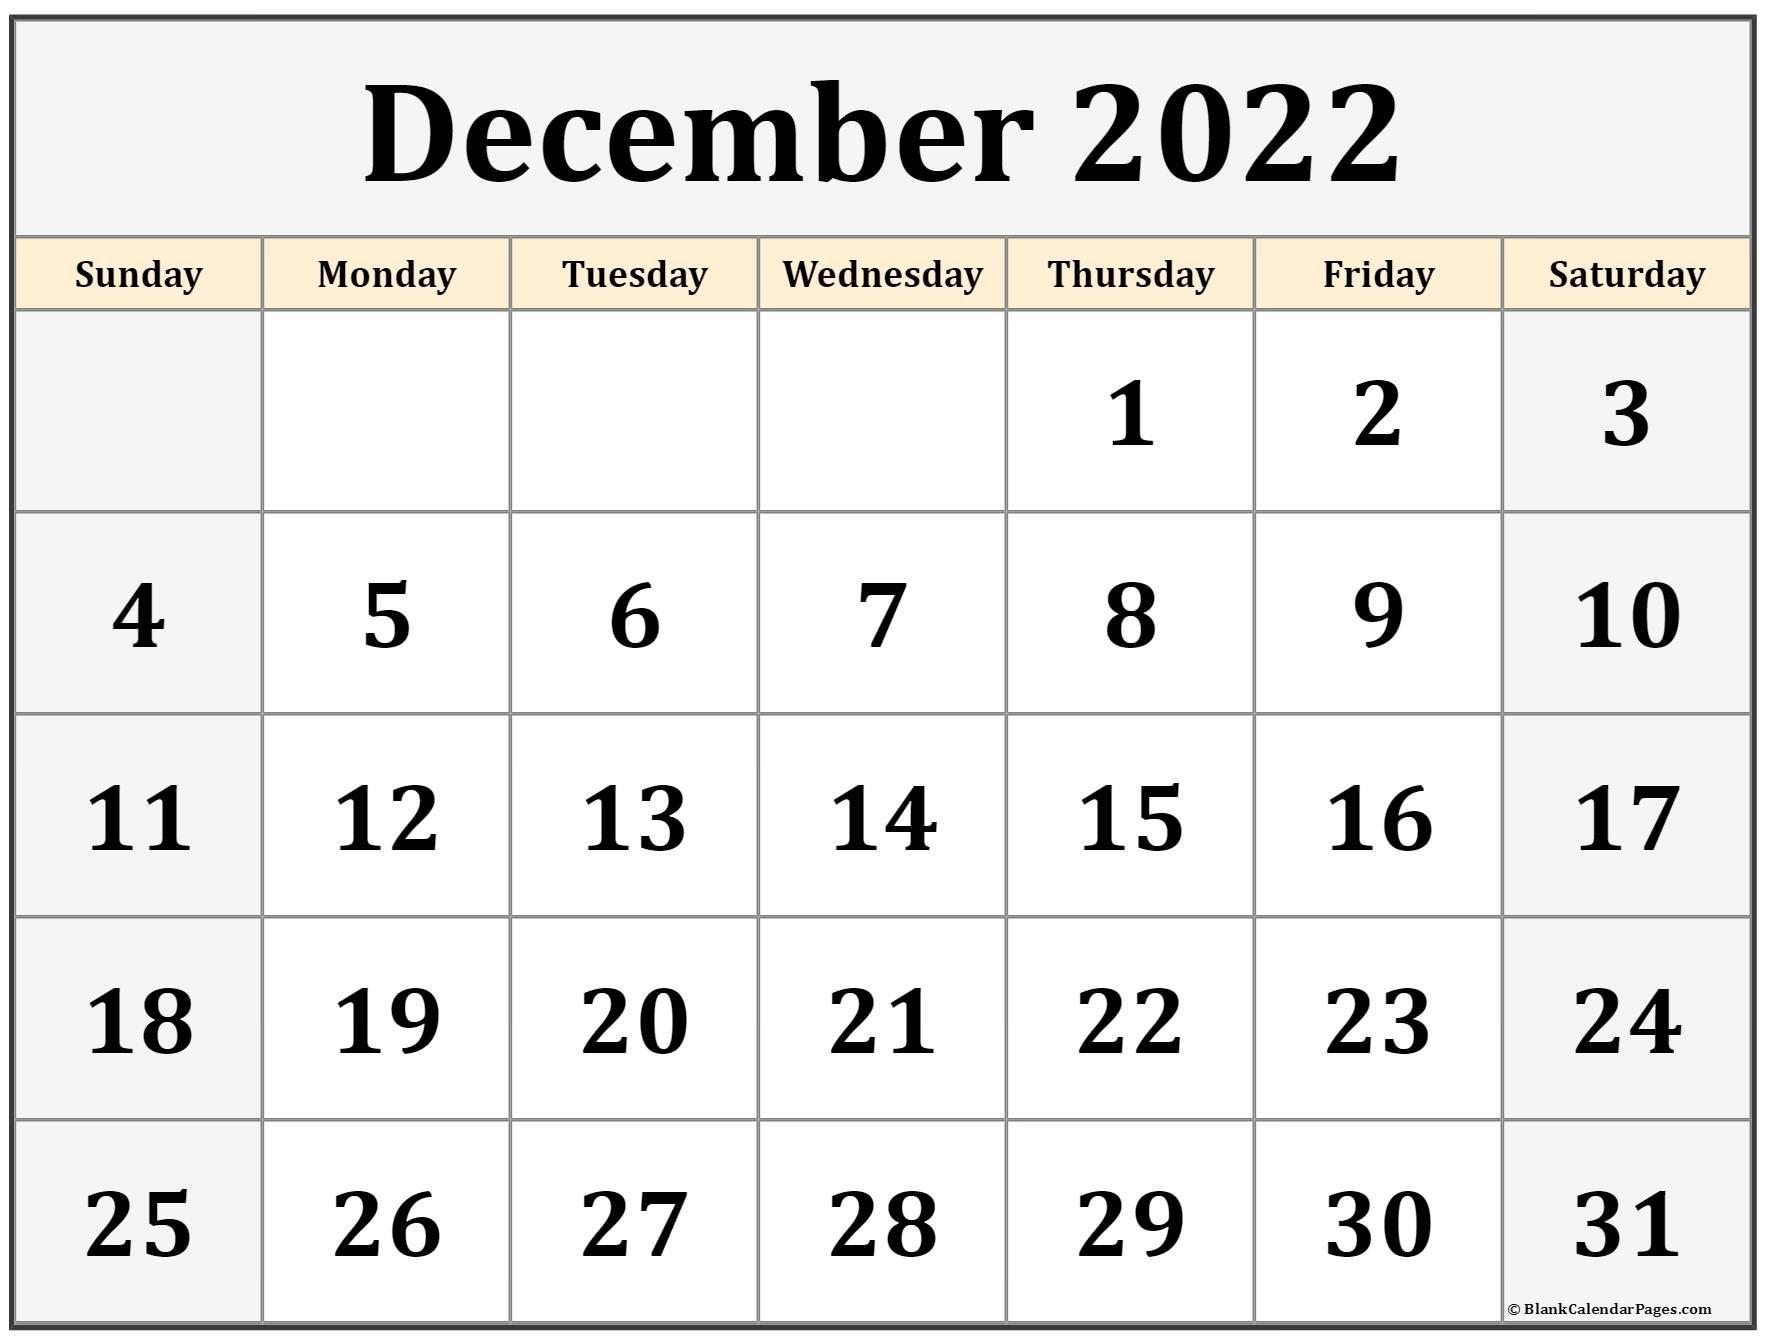 December 2022 Calendar | Free Printable Calendar Templates throughout Planner 2022 Printable Goal Image